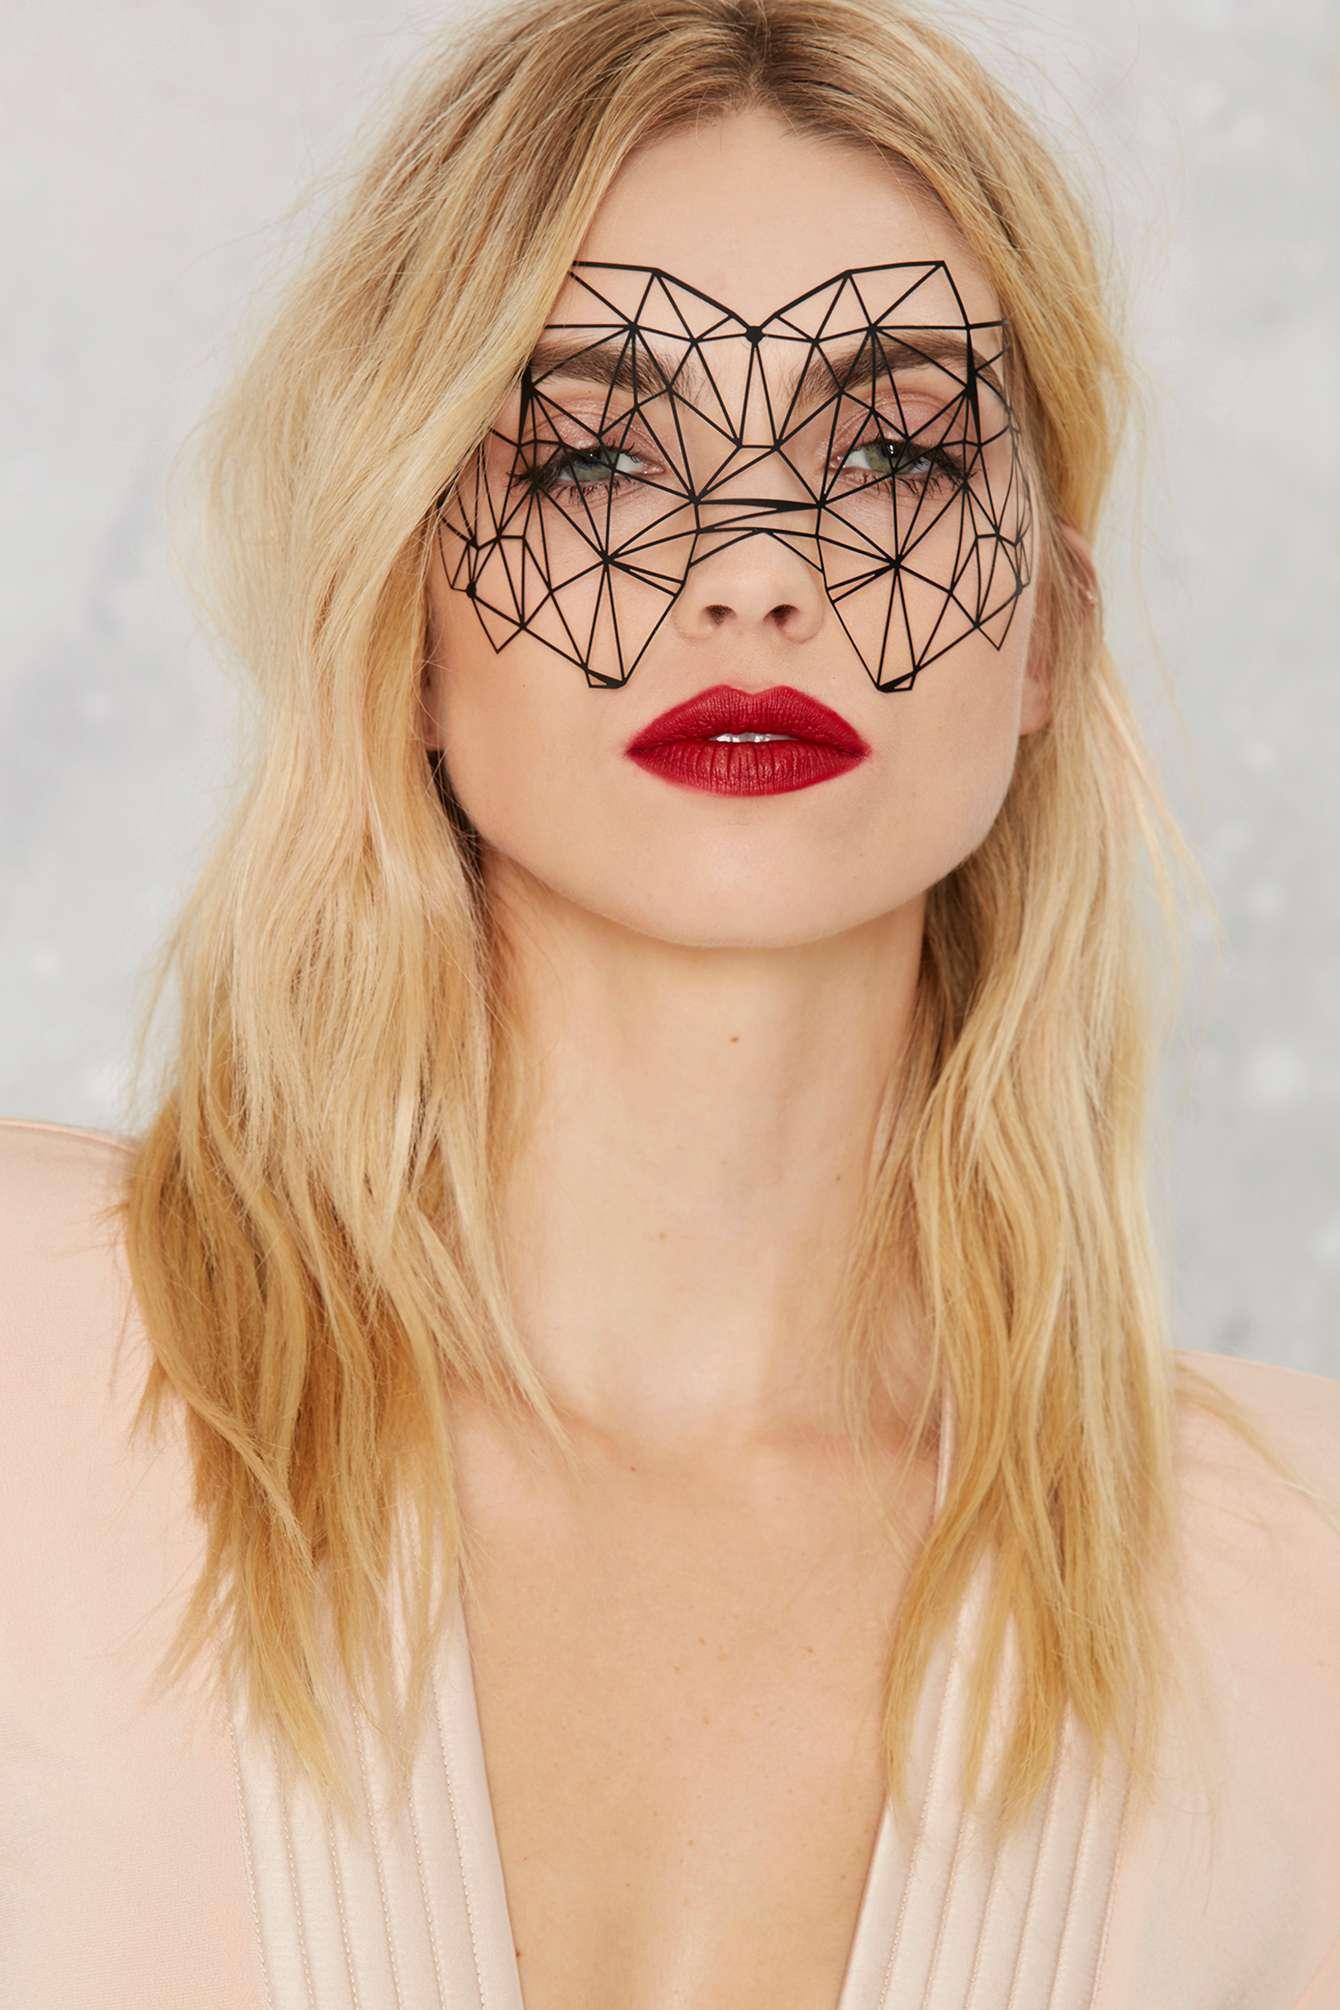 last_minute_halloween_costume_ideas_chep_accessories-11